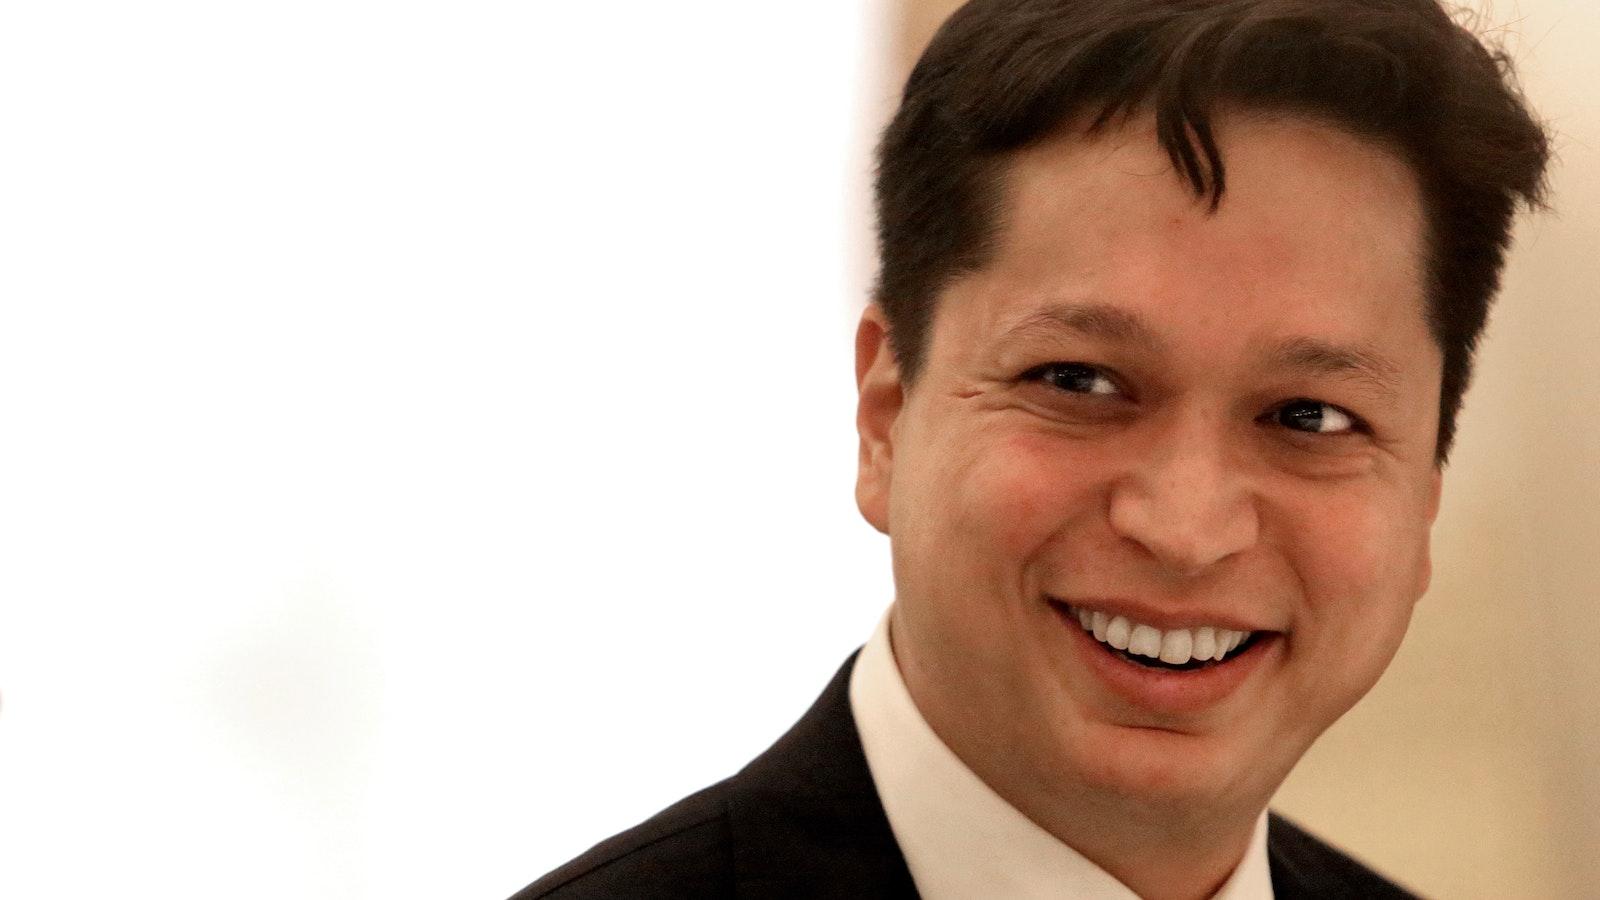 Pinterest CEO Ben Silbermann. Photo by Bloomberg